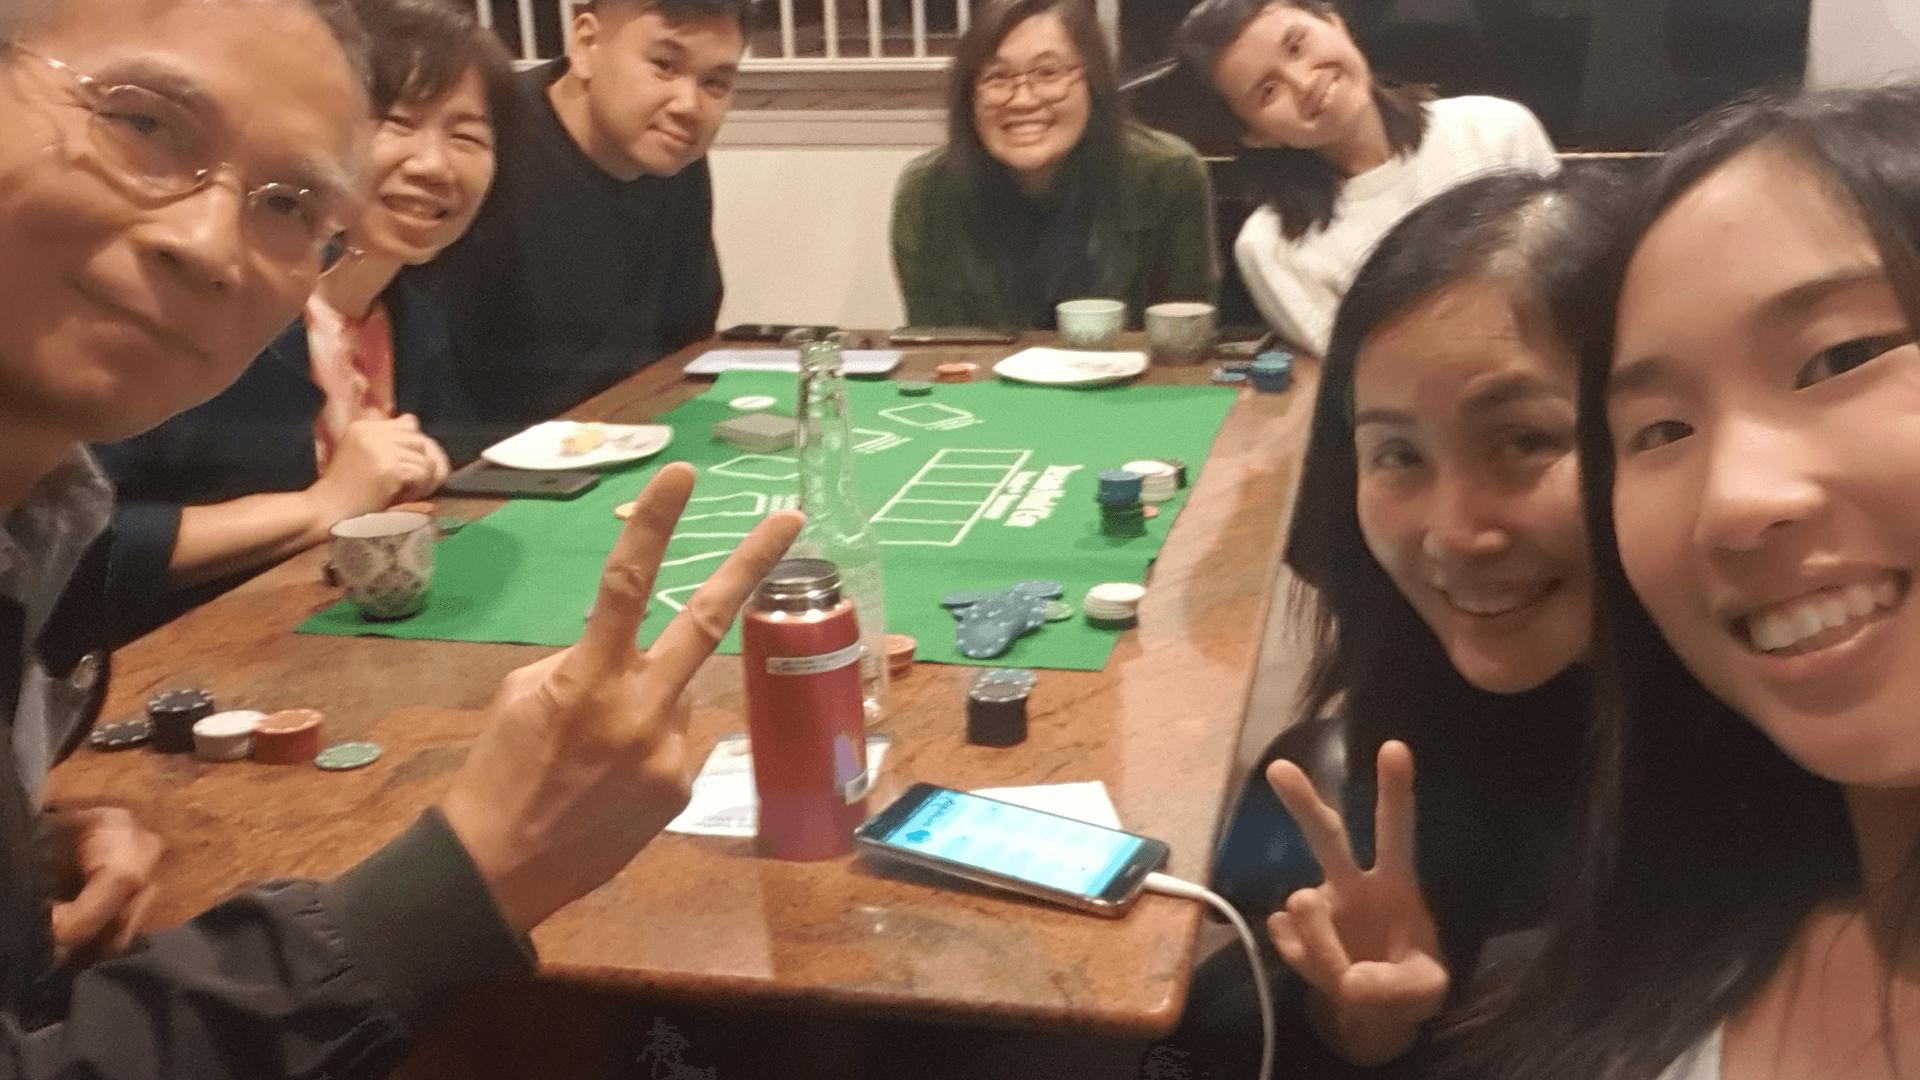 Mat_Amanda_amanda and her friends and family playing poker